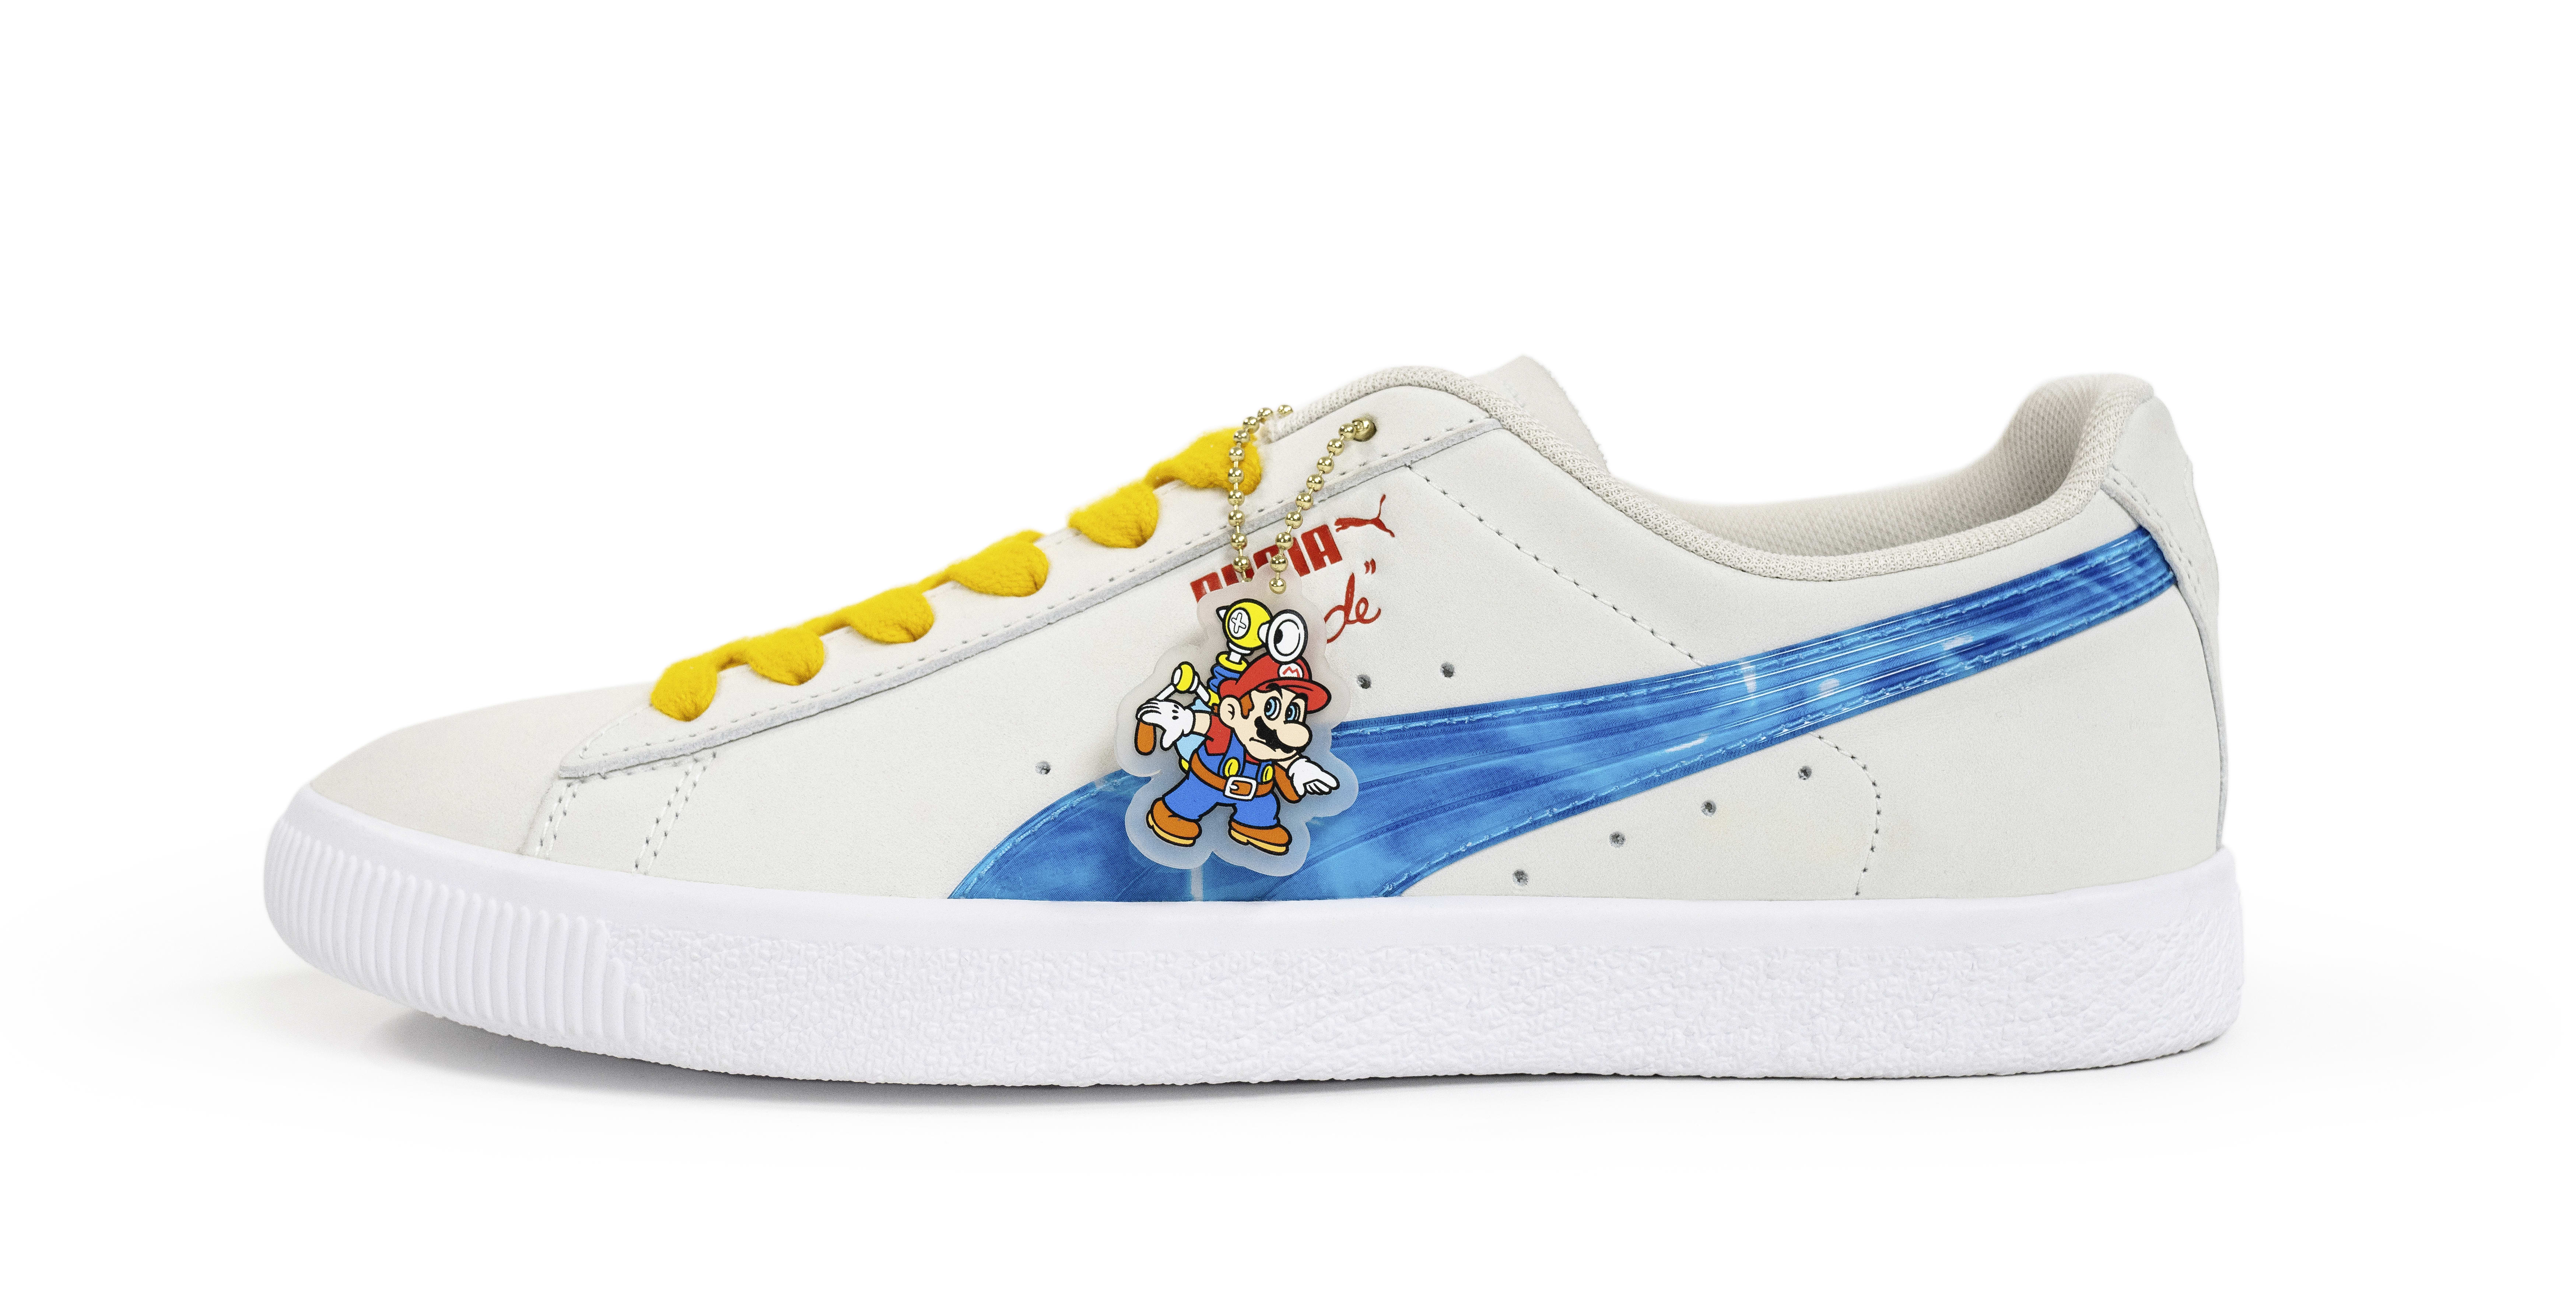 Nintendo x Puma Clyde 'Super Mario Sunshine' Lateral